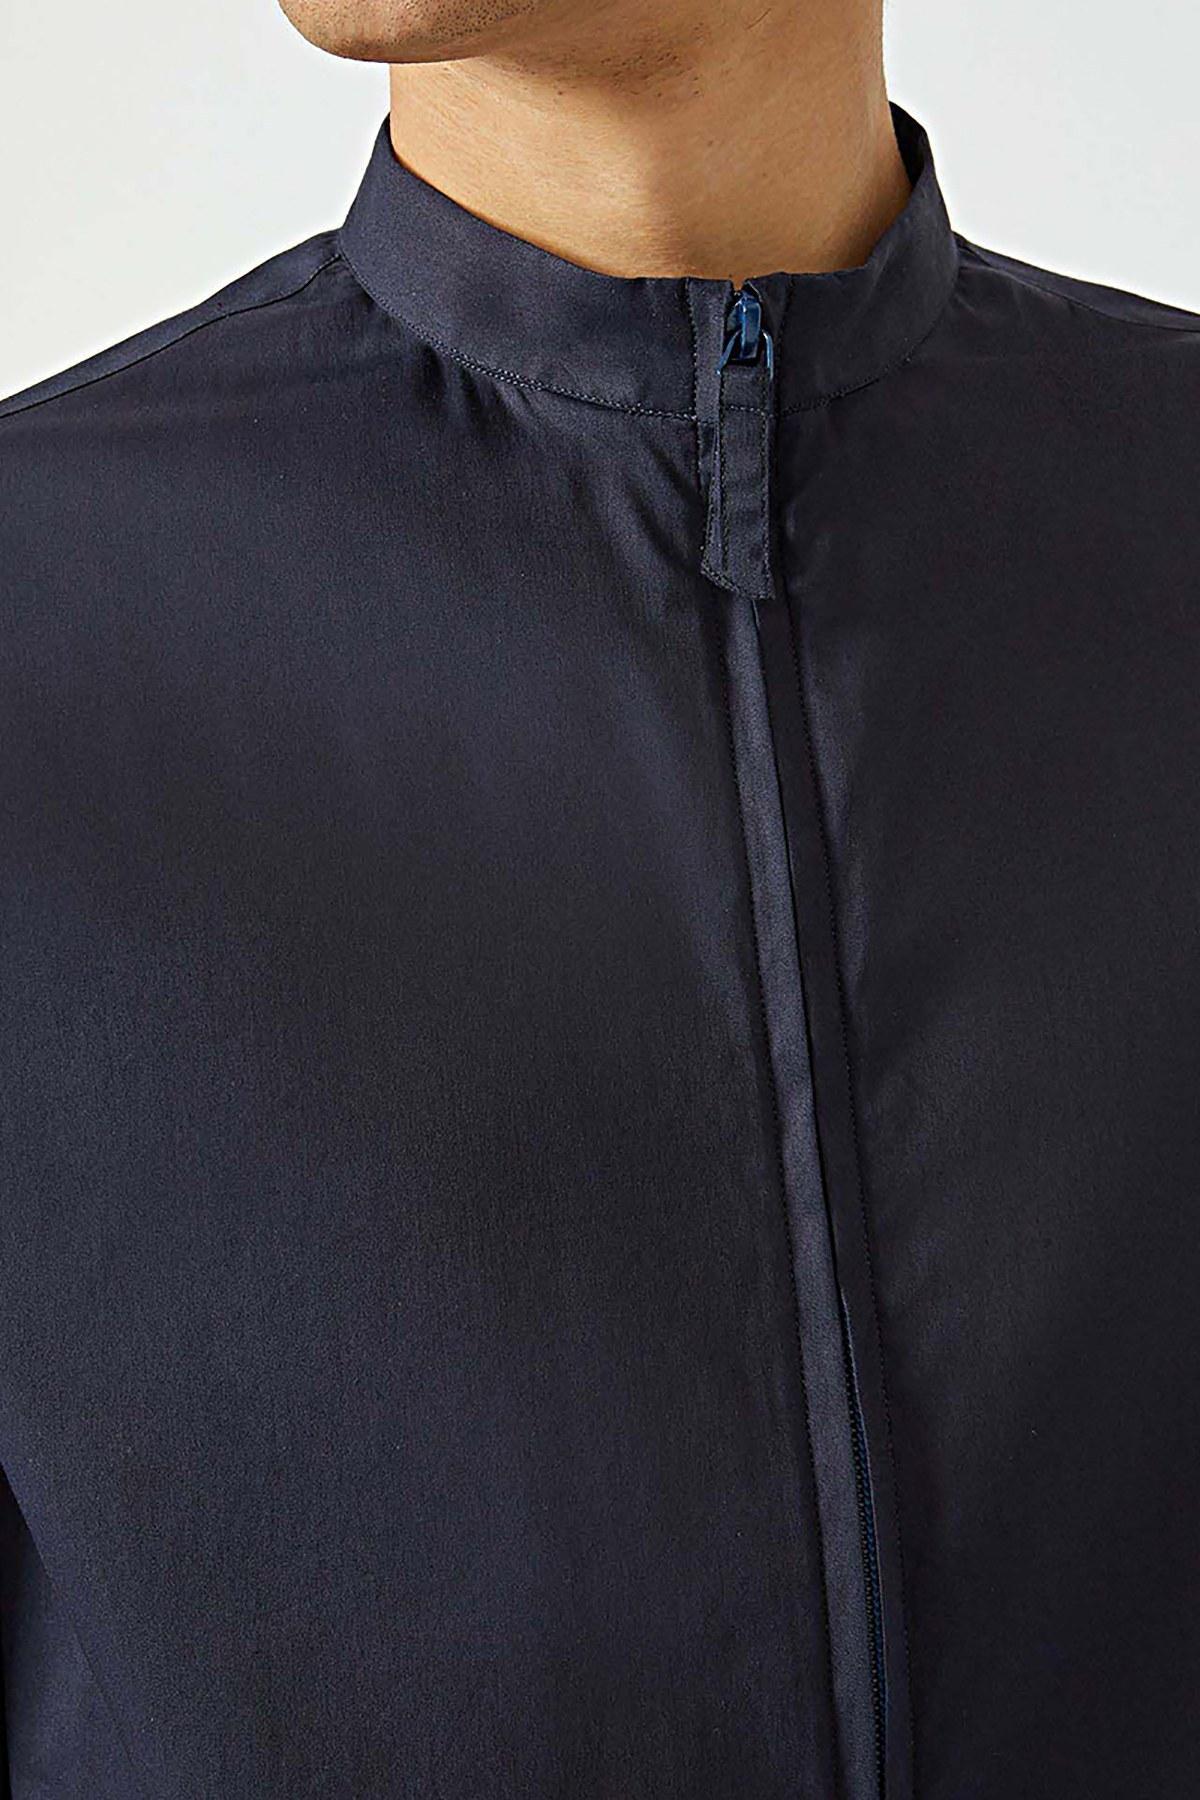 EMPORIO ARMANI Erkek Gömlek 11SMLL 11BC0 922 LACİVERT